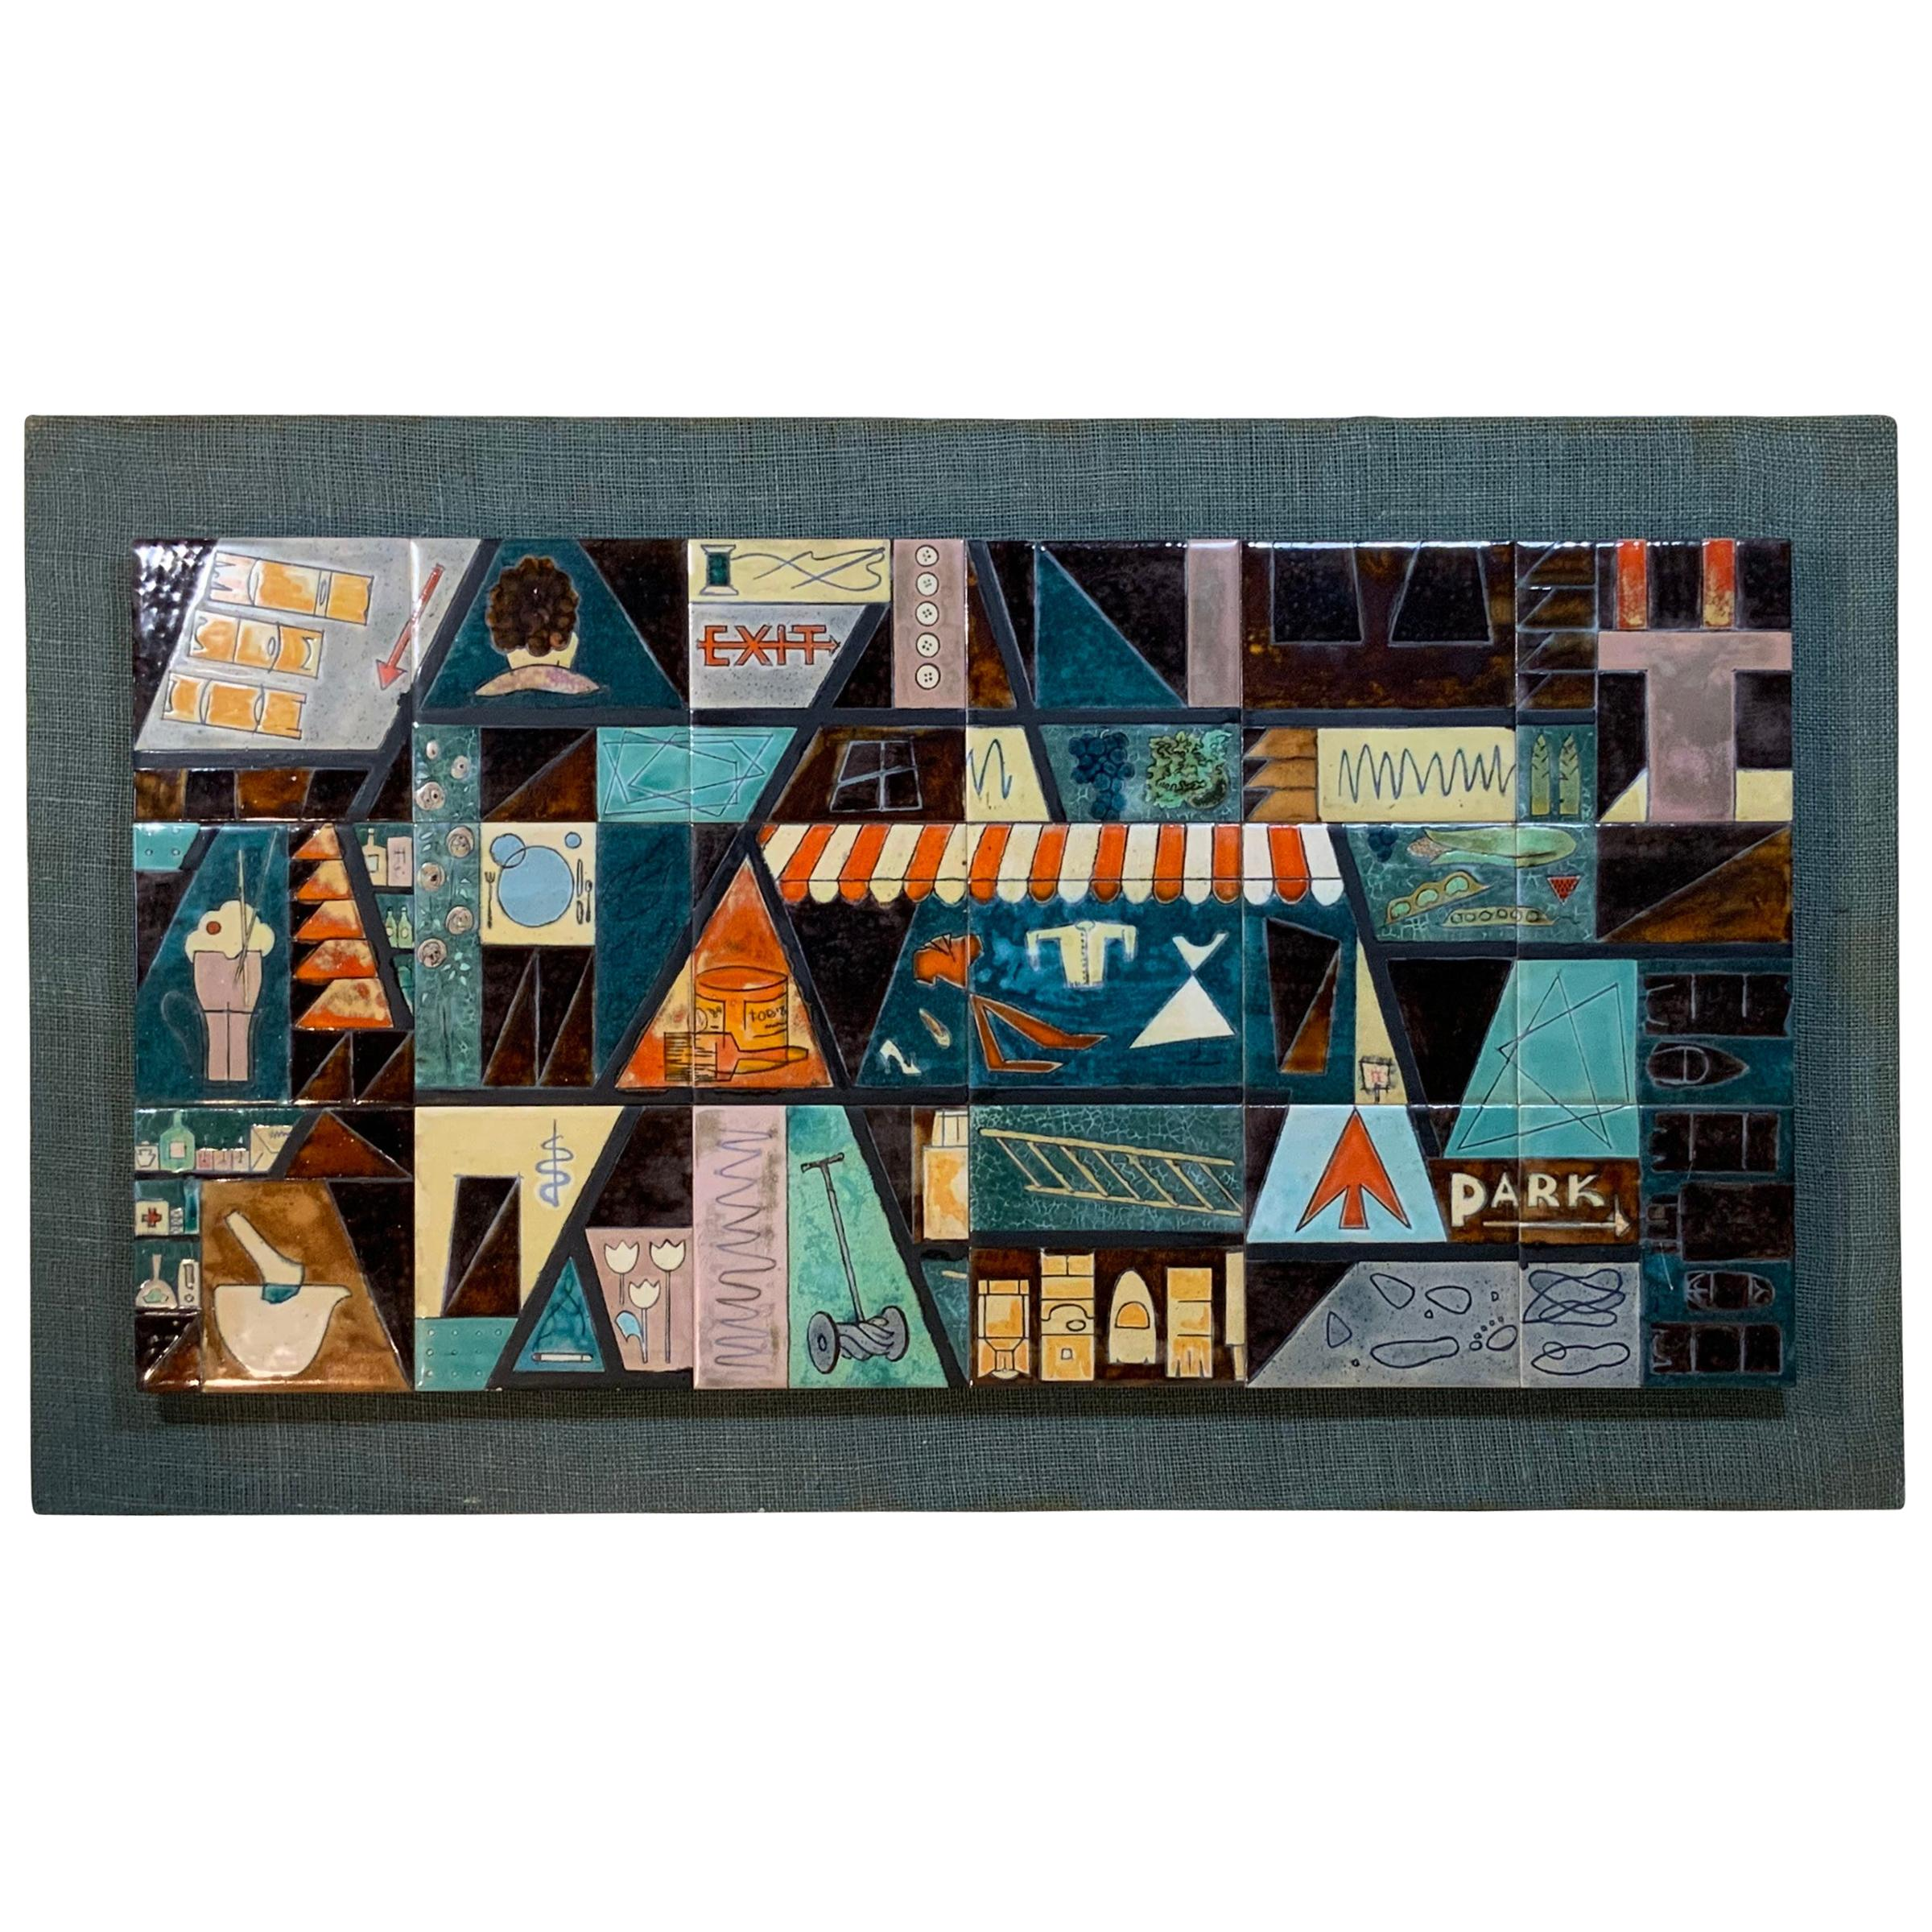 Harris Strong Rare Vintage Midcentury Wall Hanging Tile Set